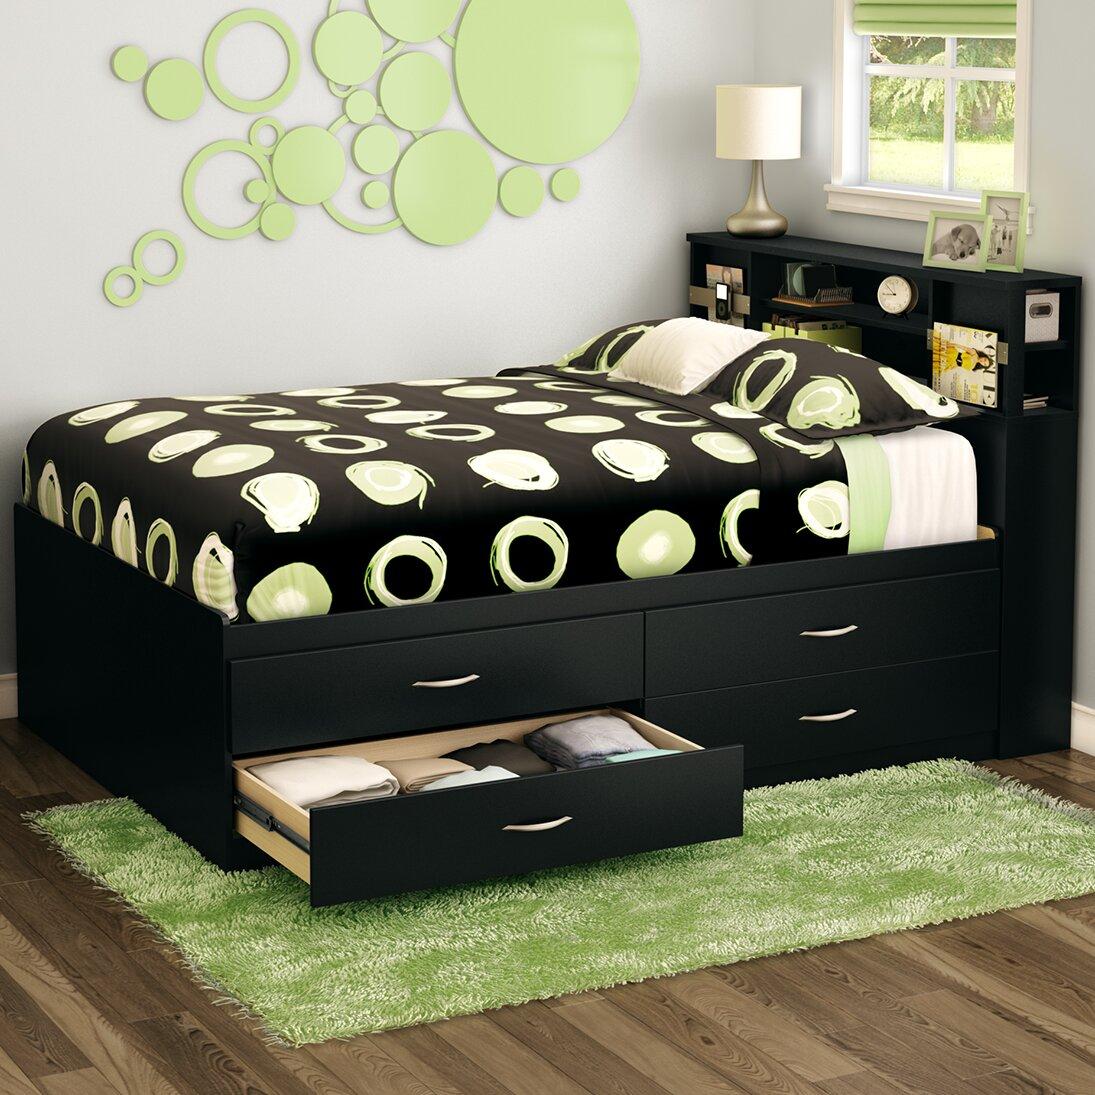 Stuff your stuff platform bed - South Shore Full Storage Platform Bed Stuff Your Stuff Platform Bed